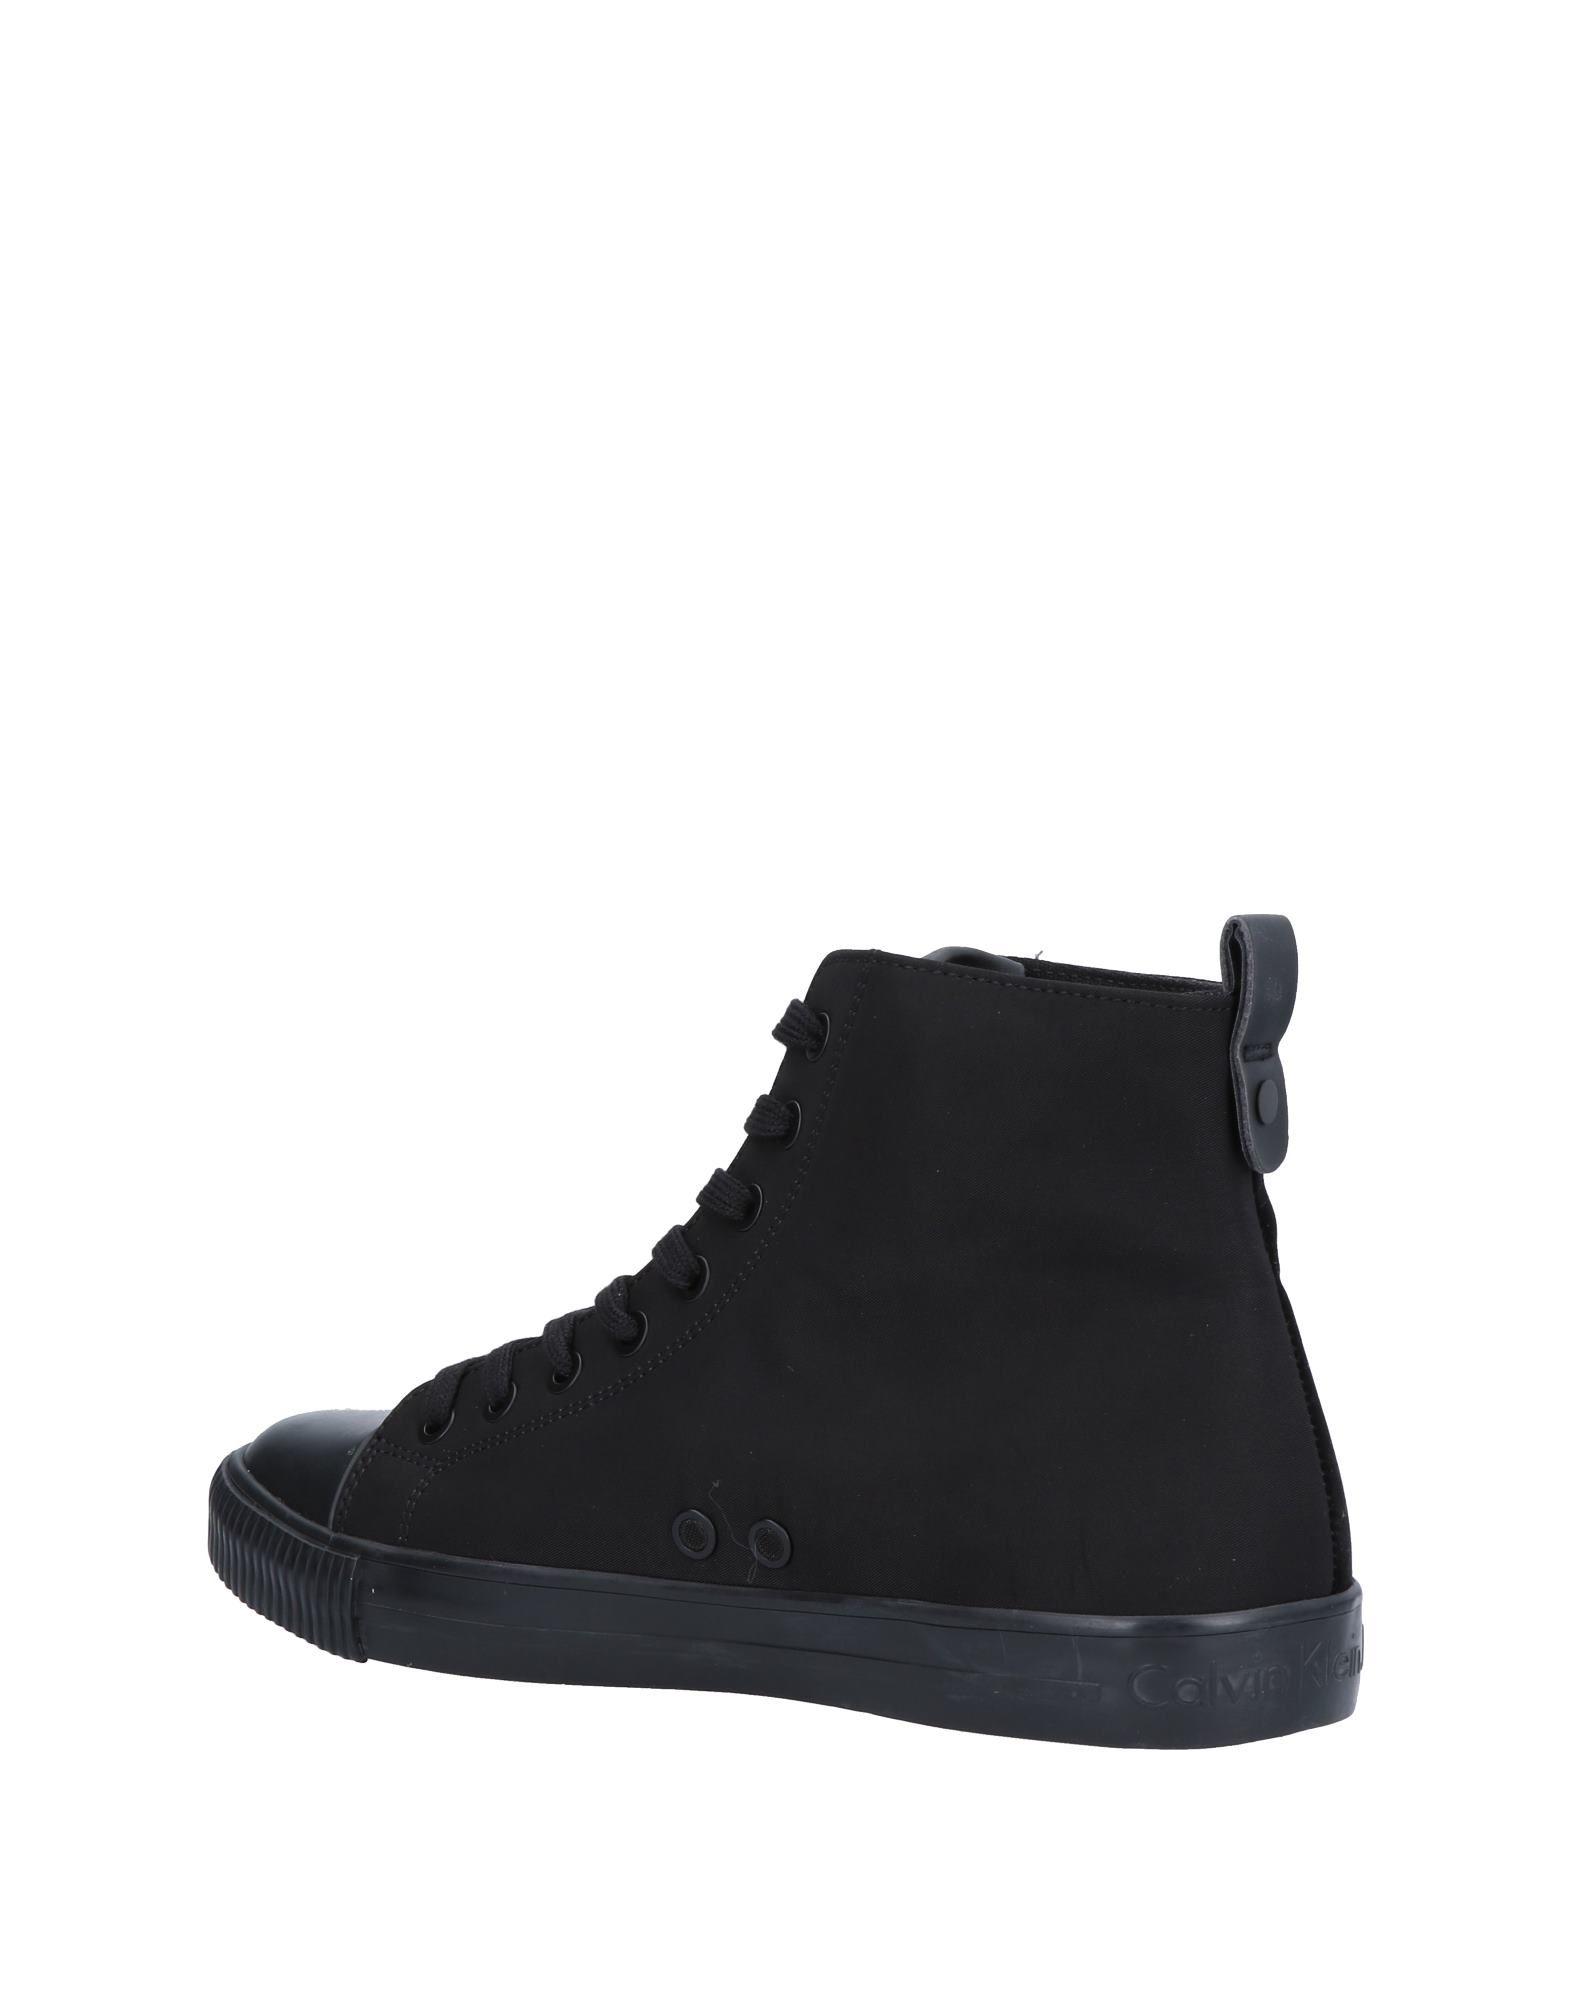 Rabatt echte Sneakers Schuhe Calvin Klein Jeans Sneakers echte Herren  11517171NI 8b5e0c